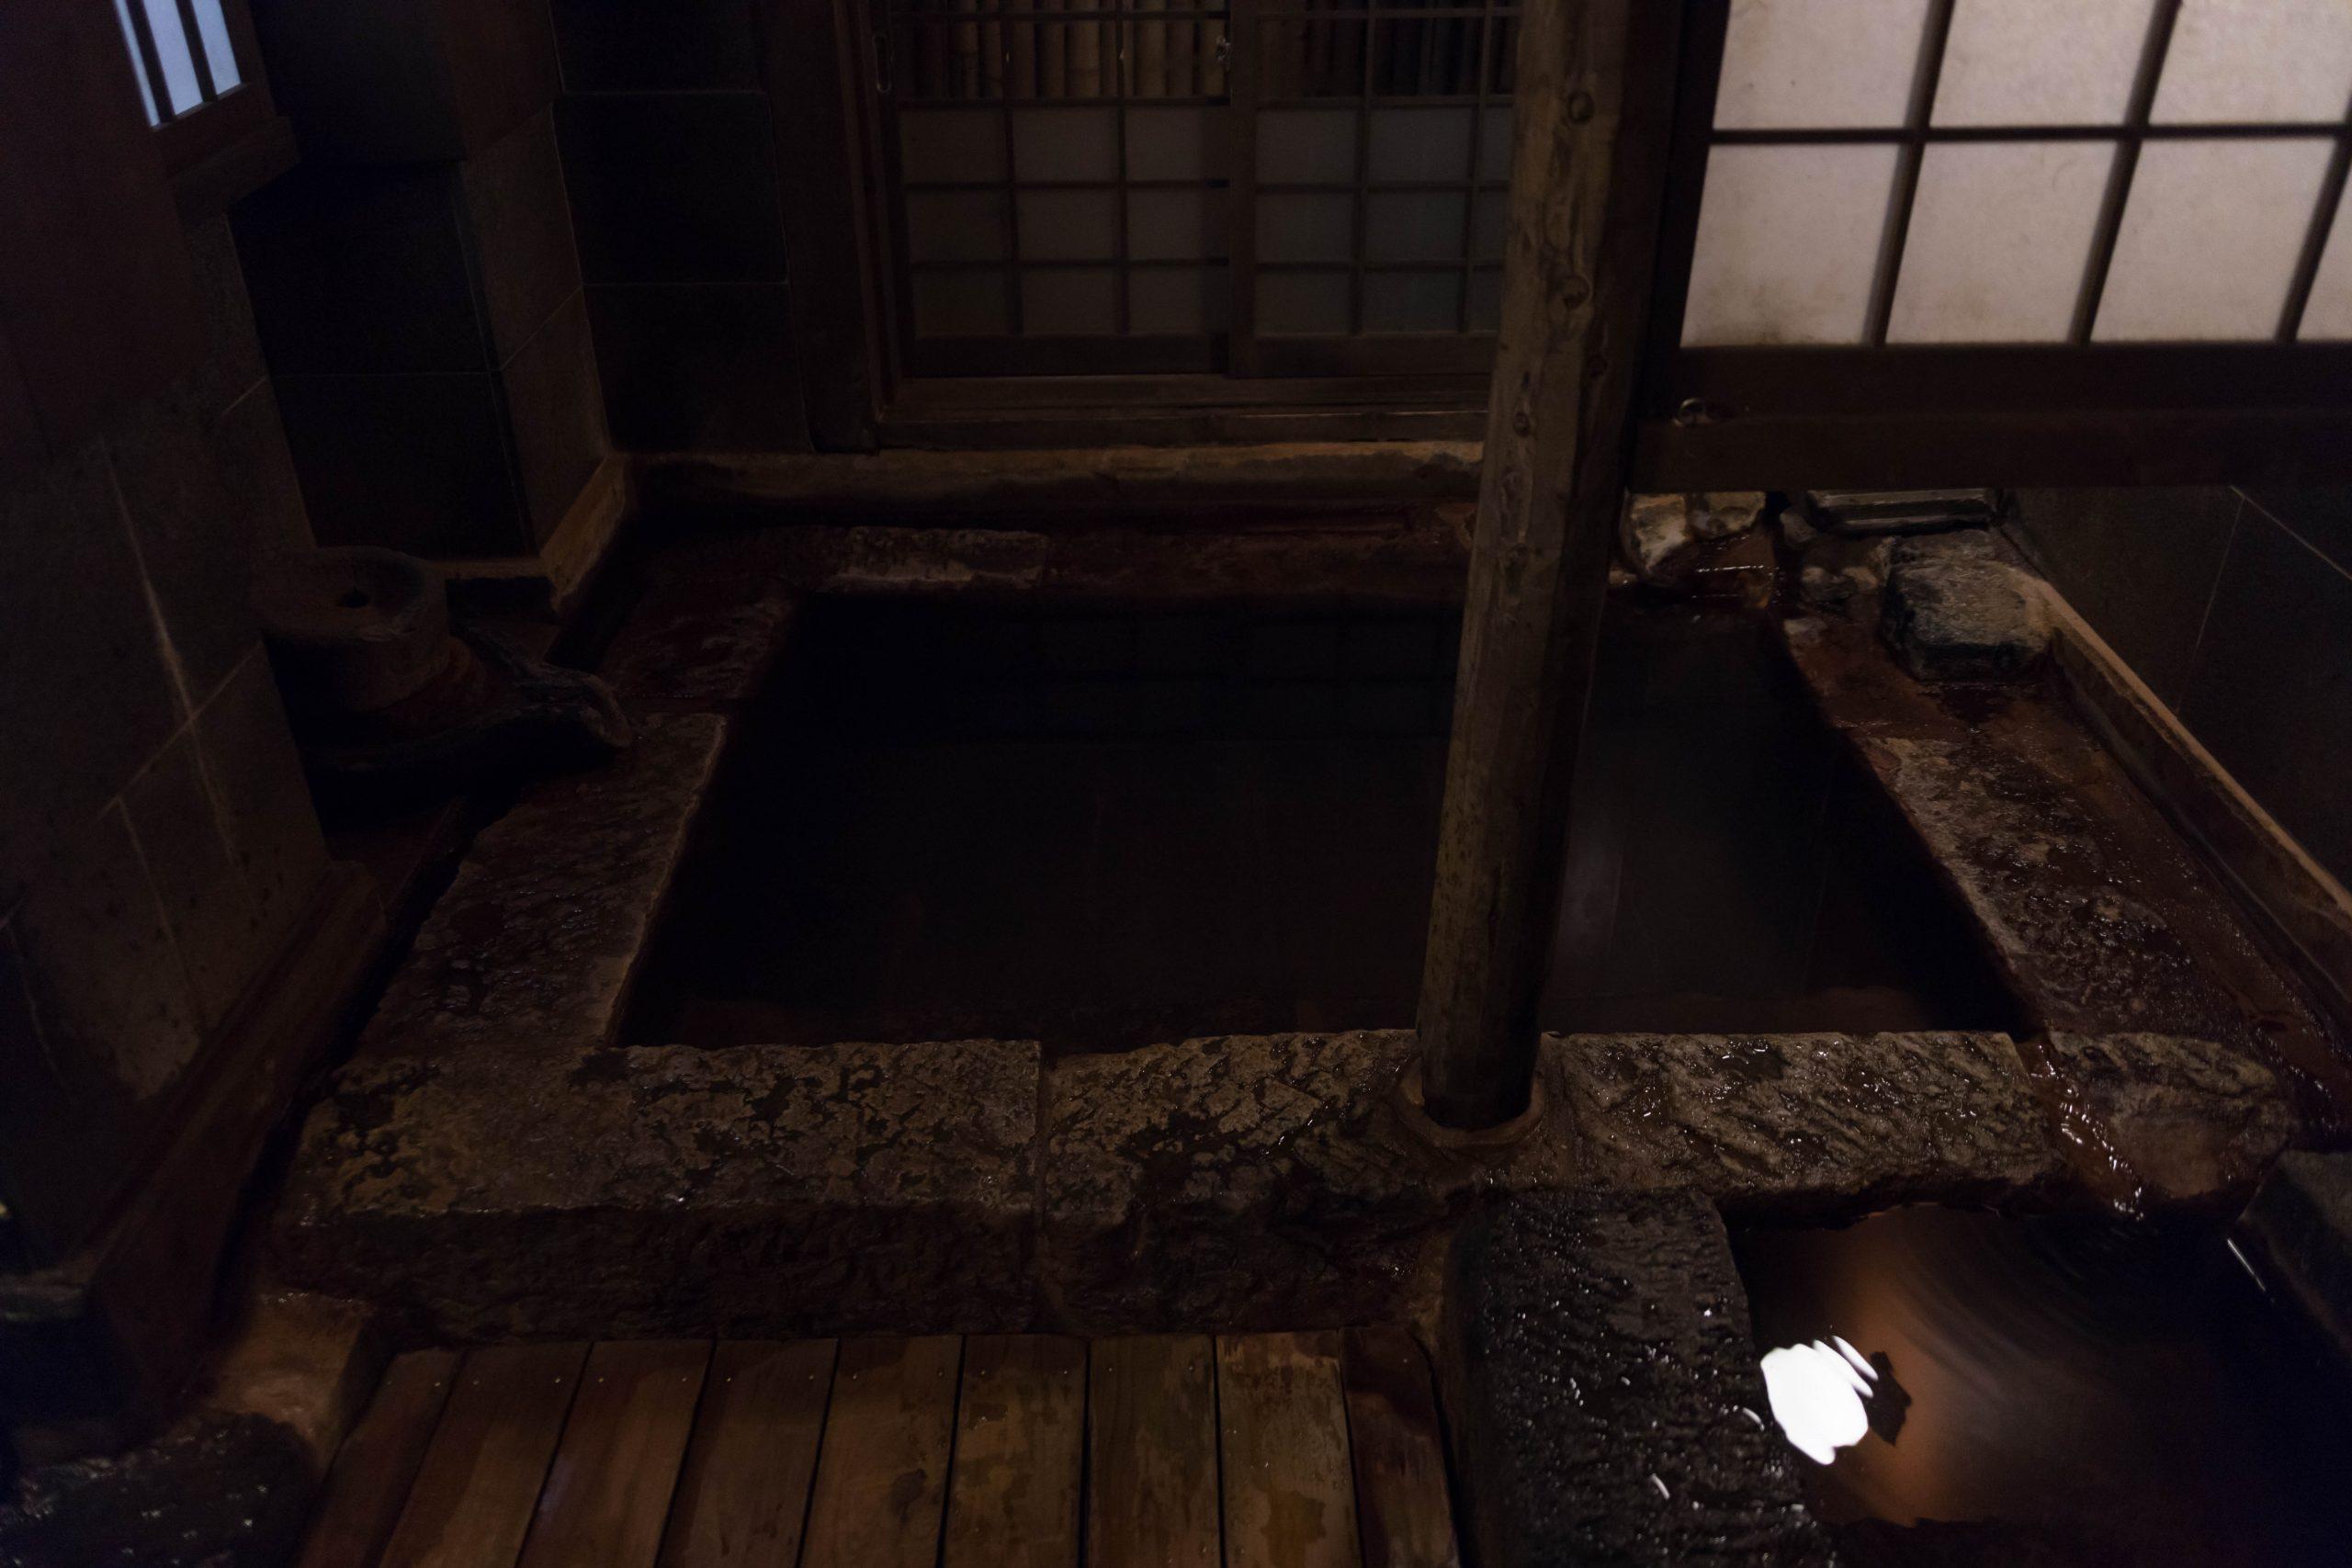 Family Bath Onsen Hot Springs Etiquette in Japan by Annie Fairfax